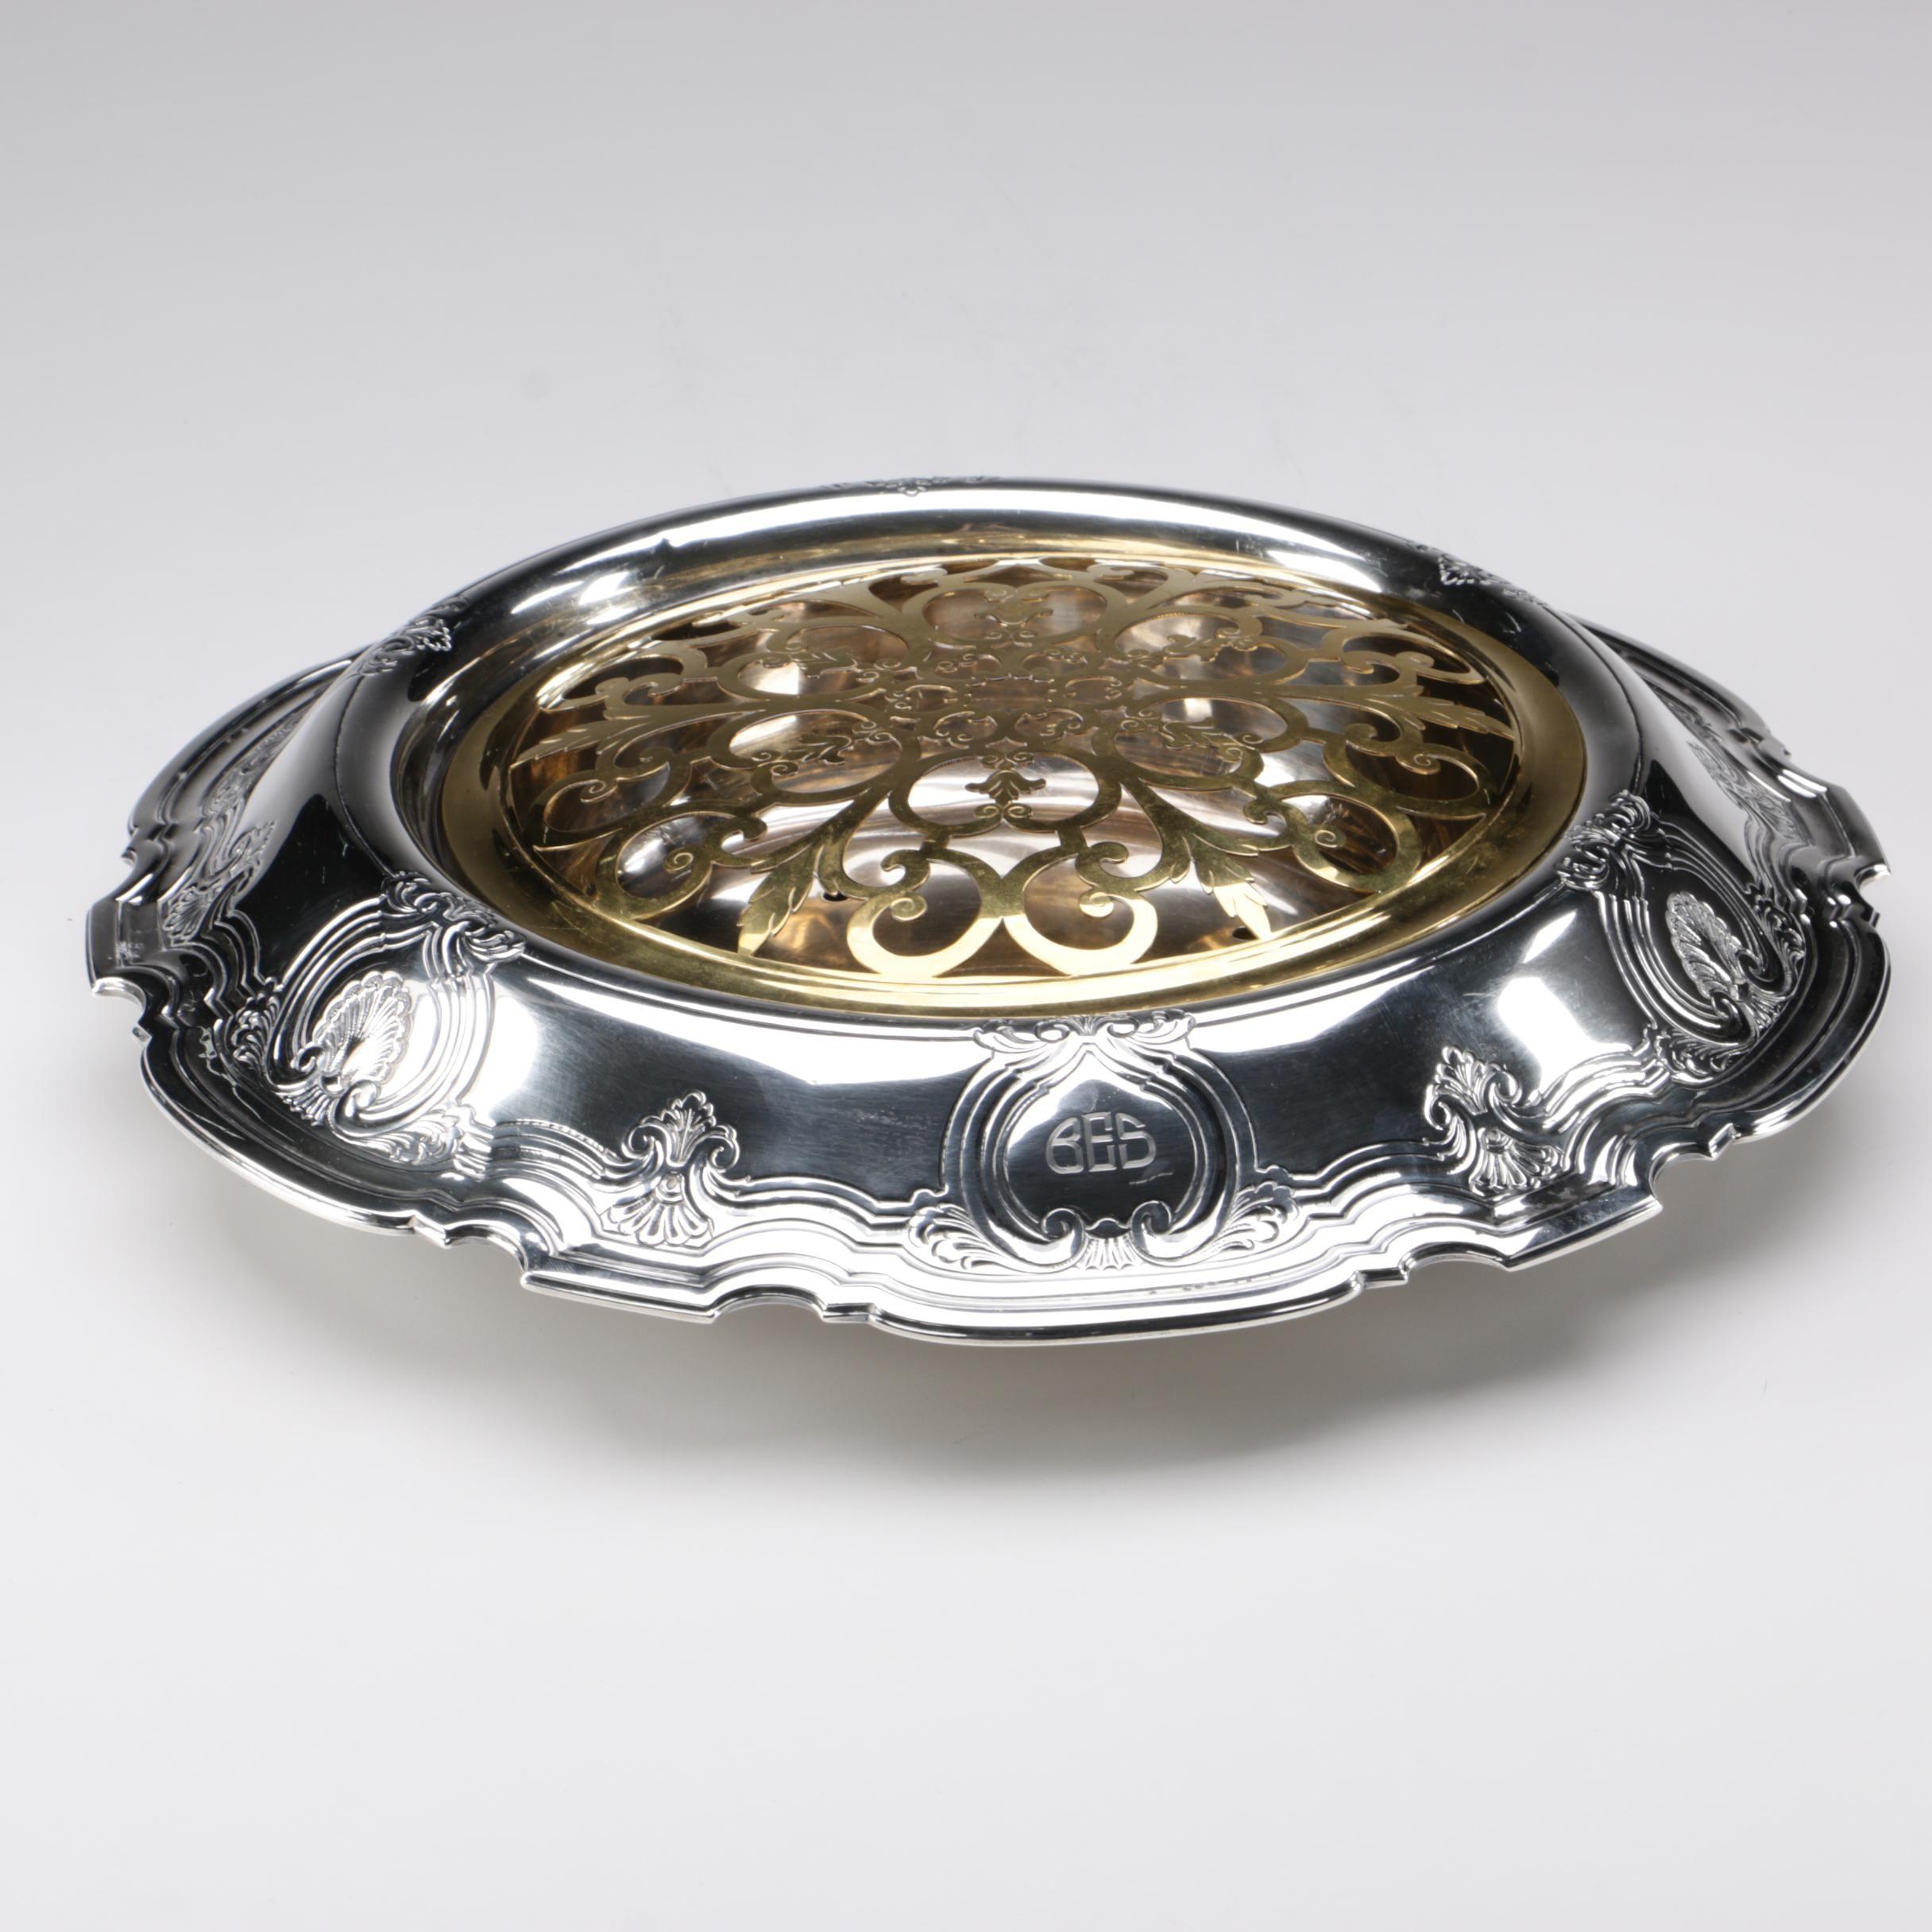 Tiffany & Co. Sterling Centerpiece Bowl Flower Arranger, 1921